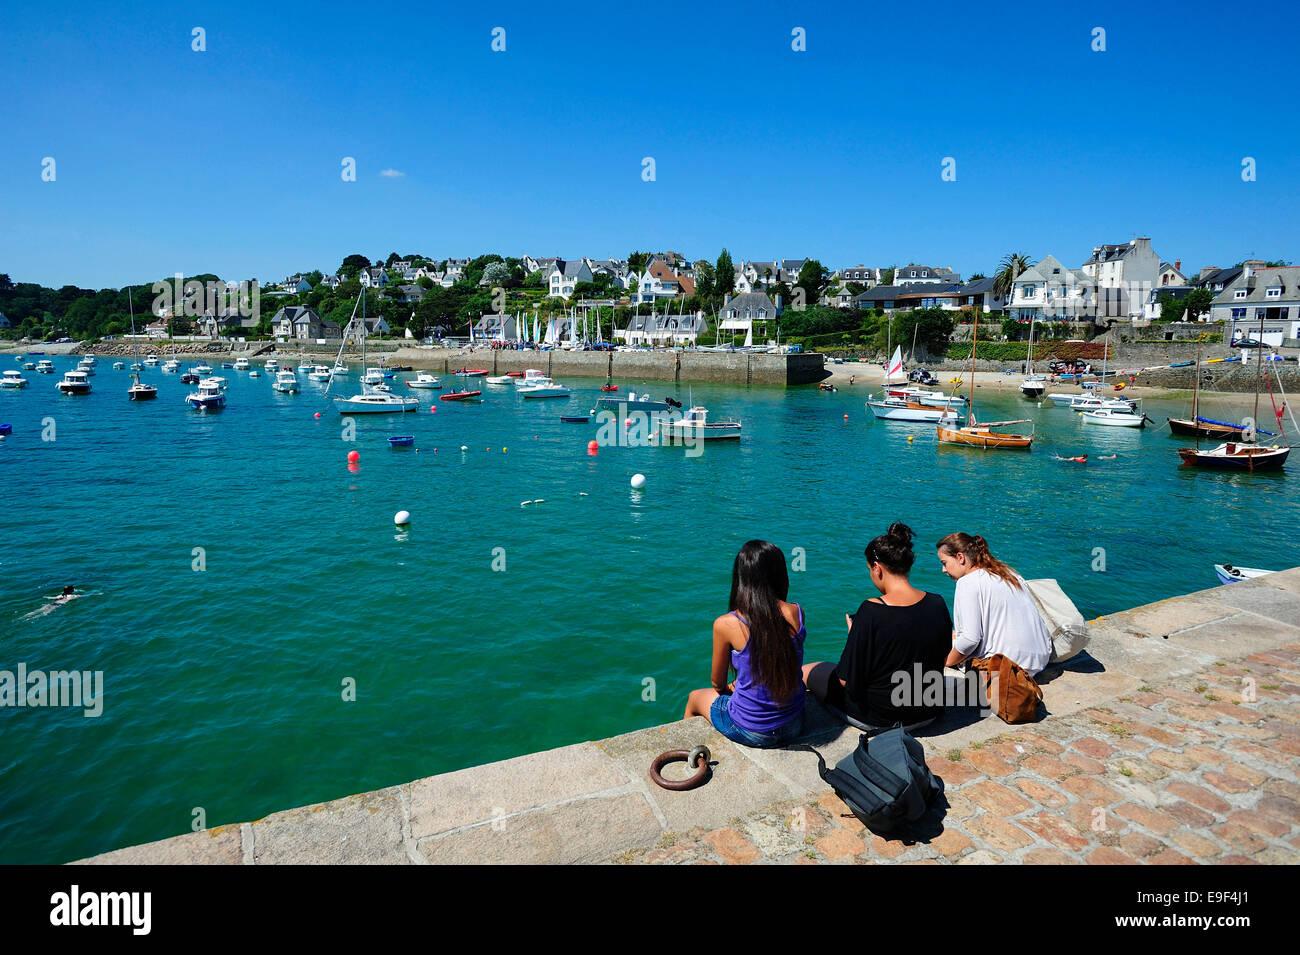 Locquirec (Brittany): the quays - Stock Image